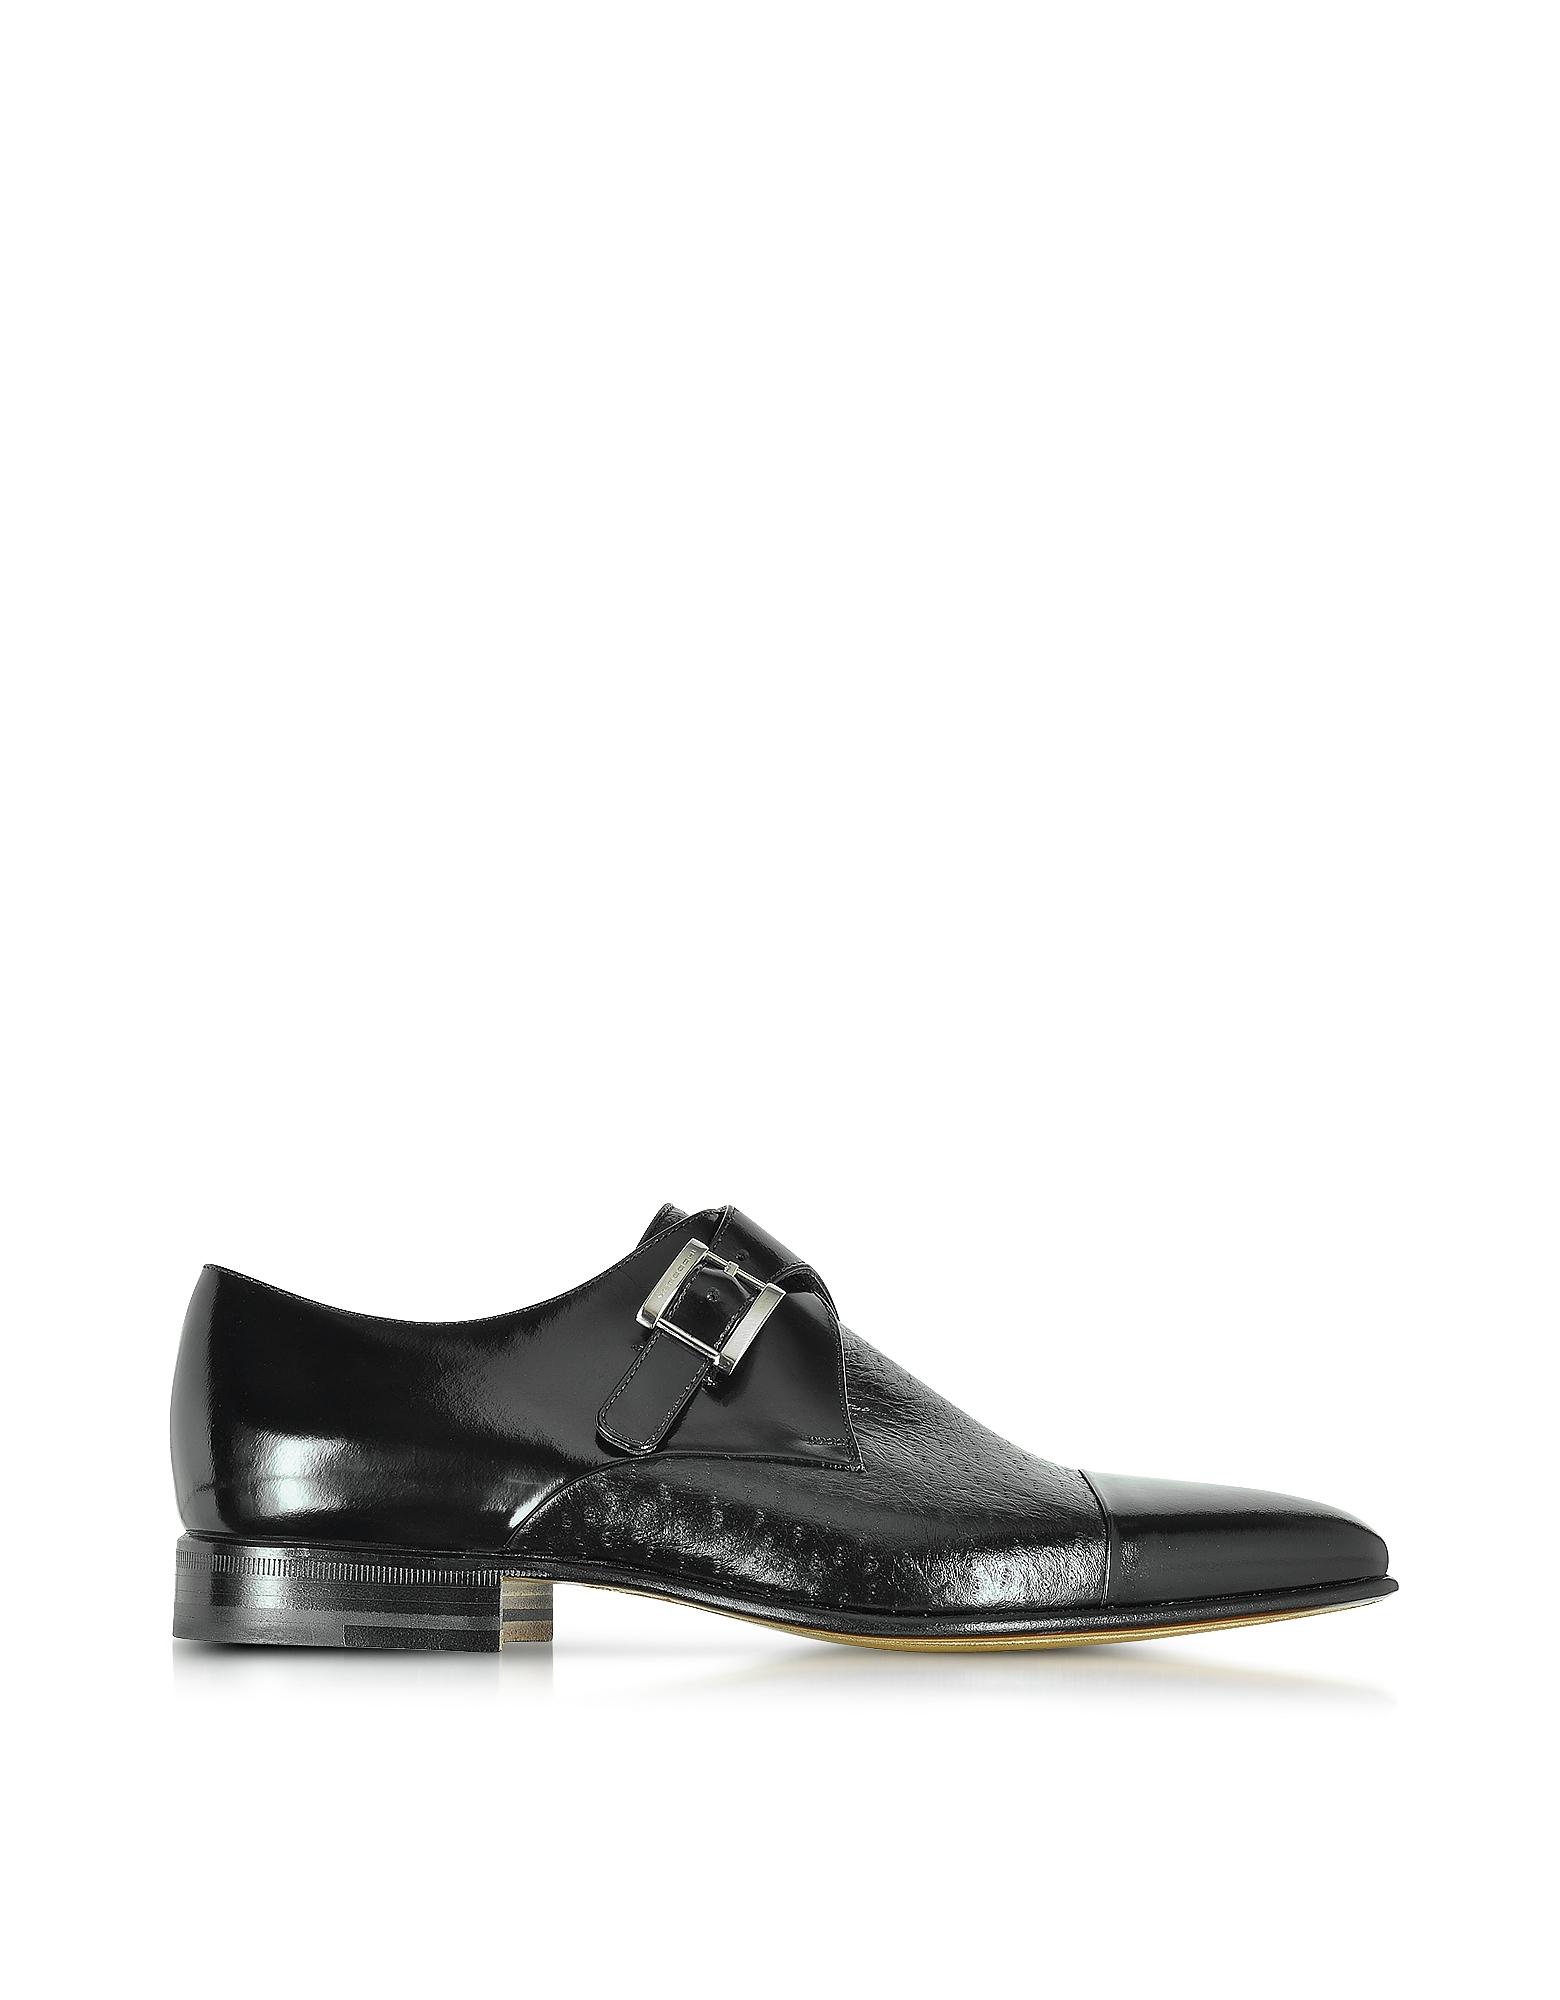 Moreschi Designer Shoes, Nancy Black Peccary Leather Monk Strap Shoe